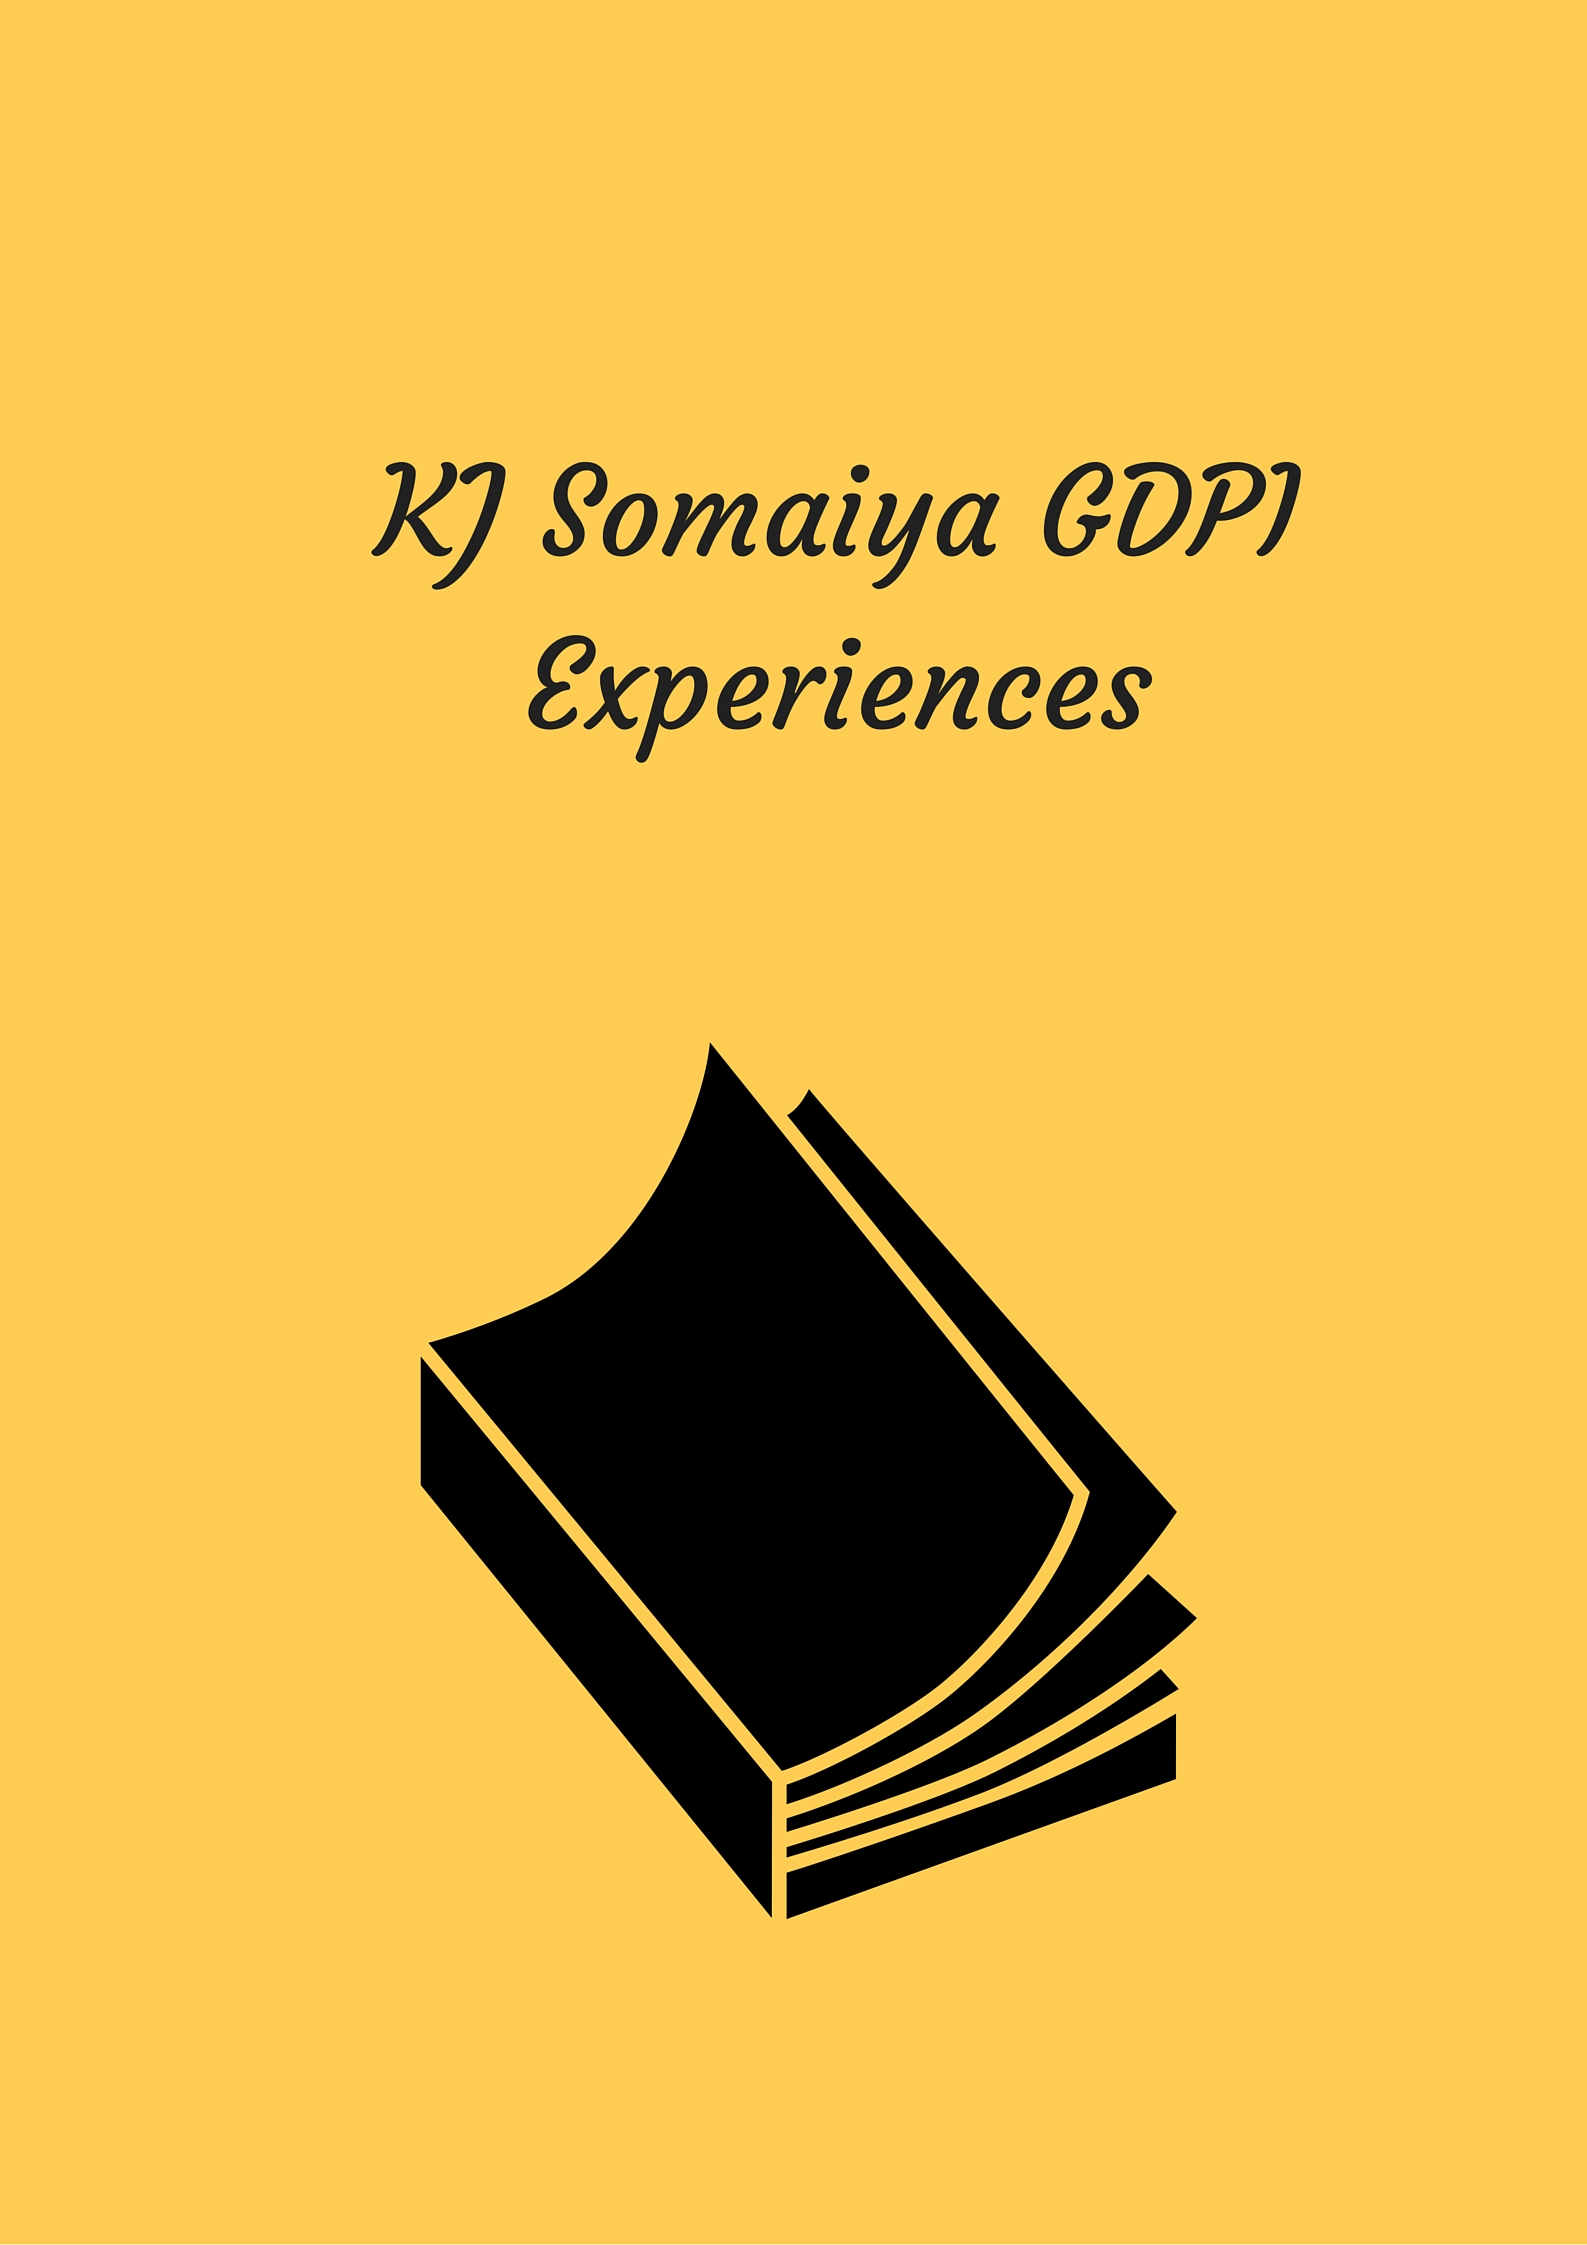 KJ Somaiya GDPI Experiences